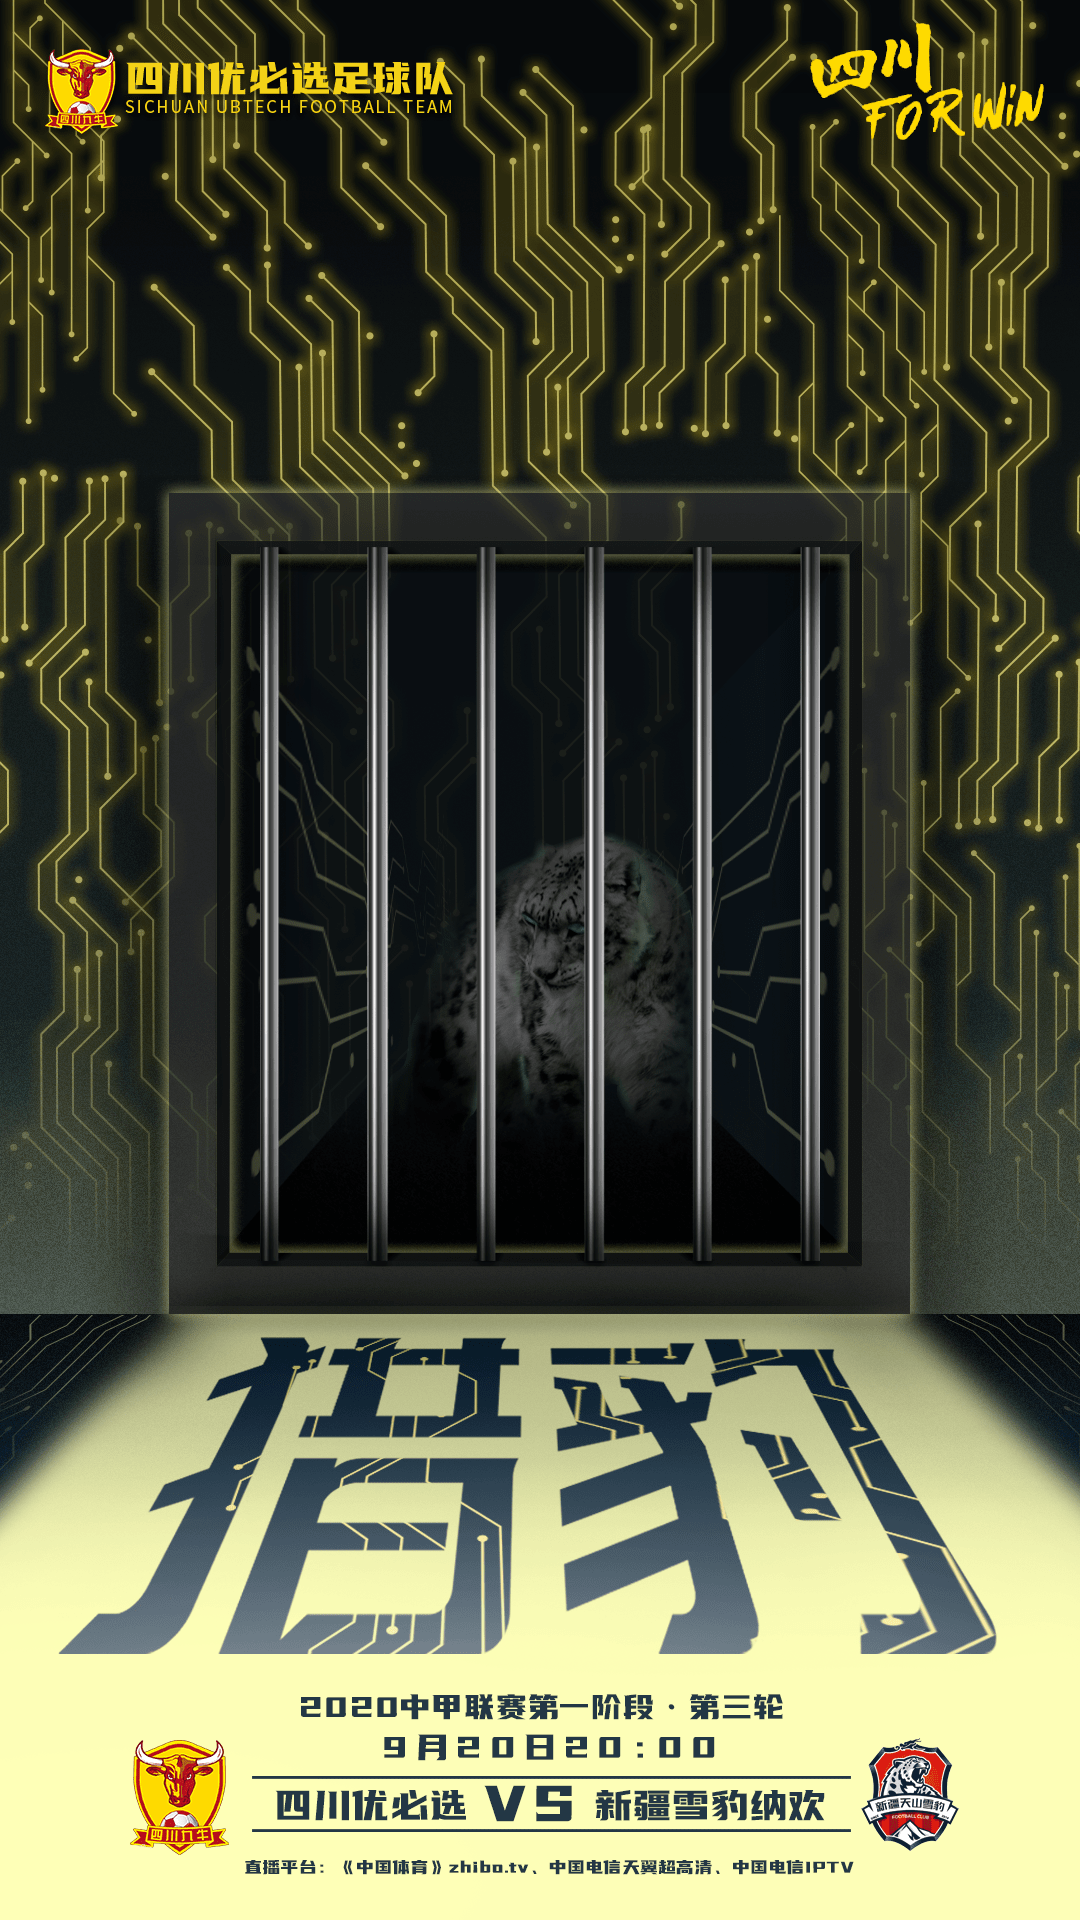 OD体育- 【赛事预告】猎豹 四川优必选枕戈以待(图1)